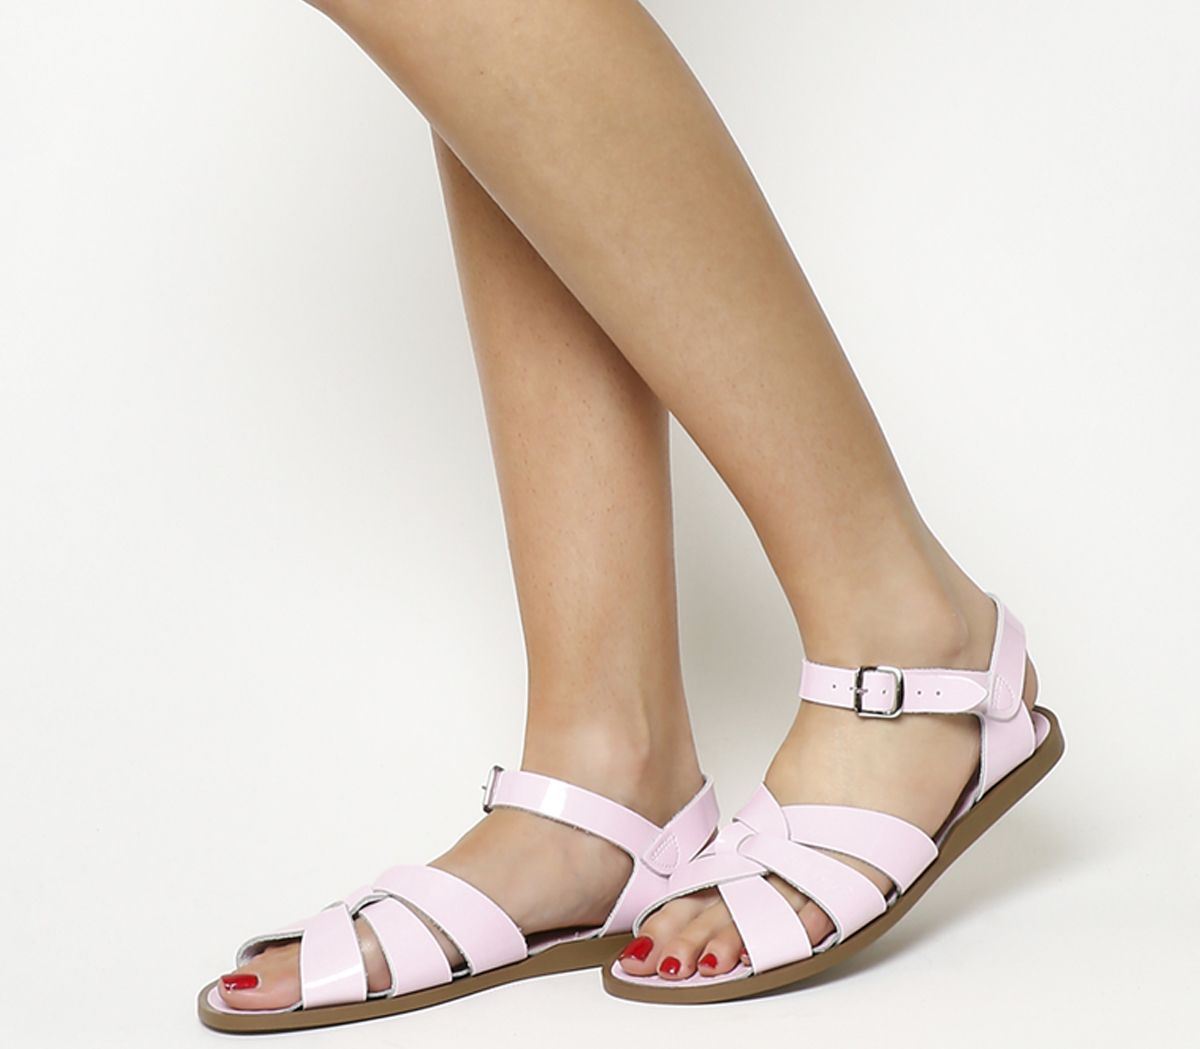 e31bb6be85153 Salt Water Salt Water Original Shiny Pink Patent - Sandals